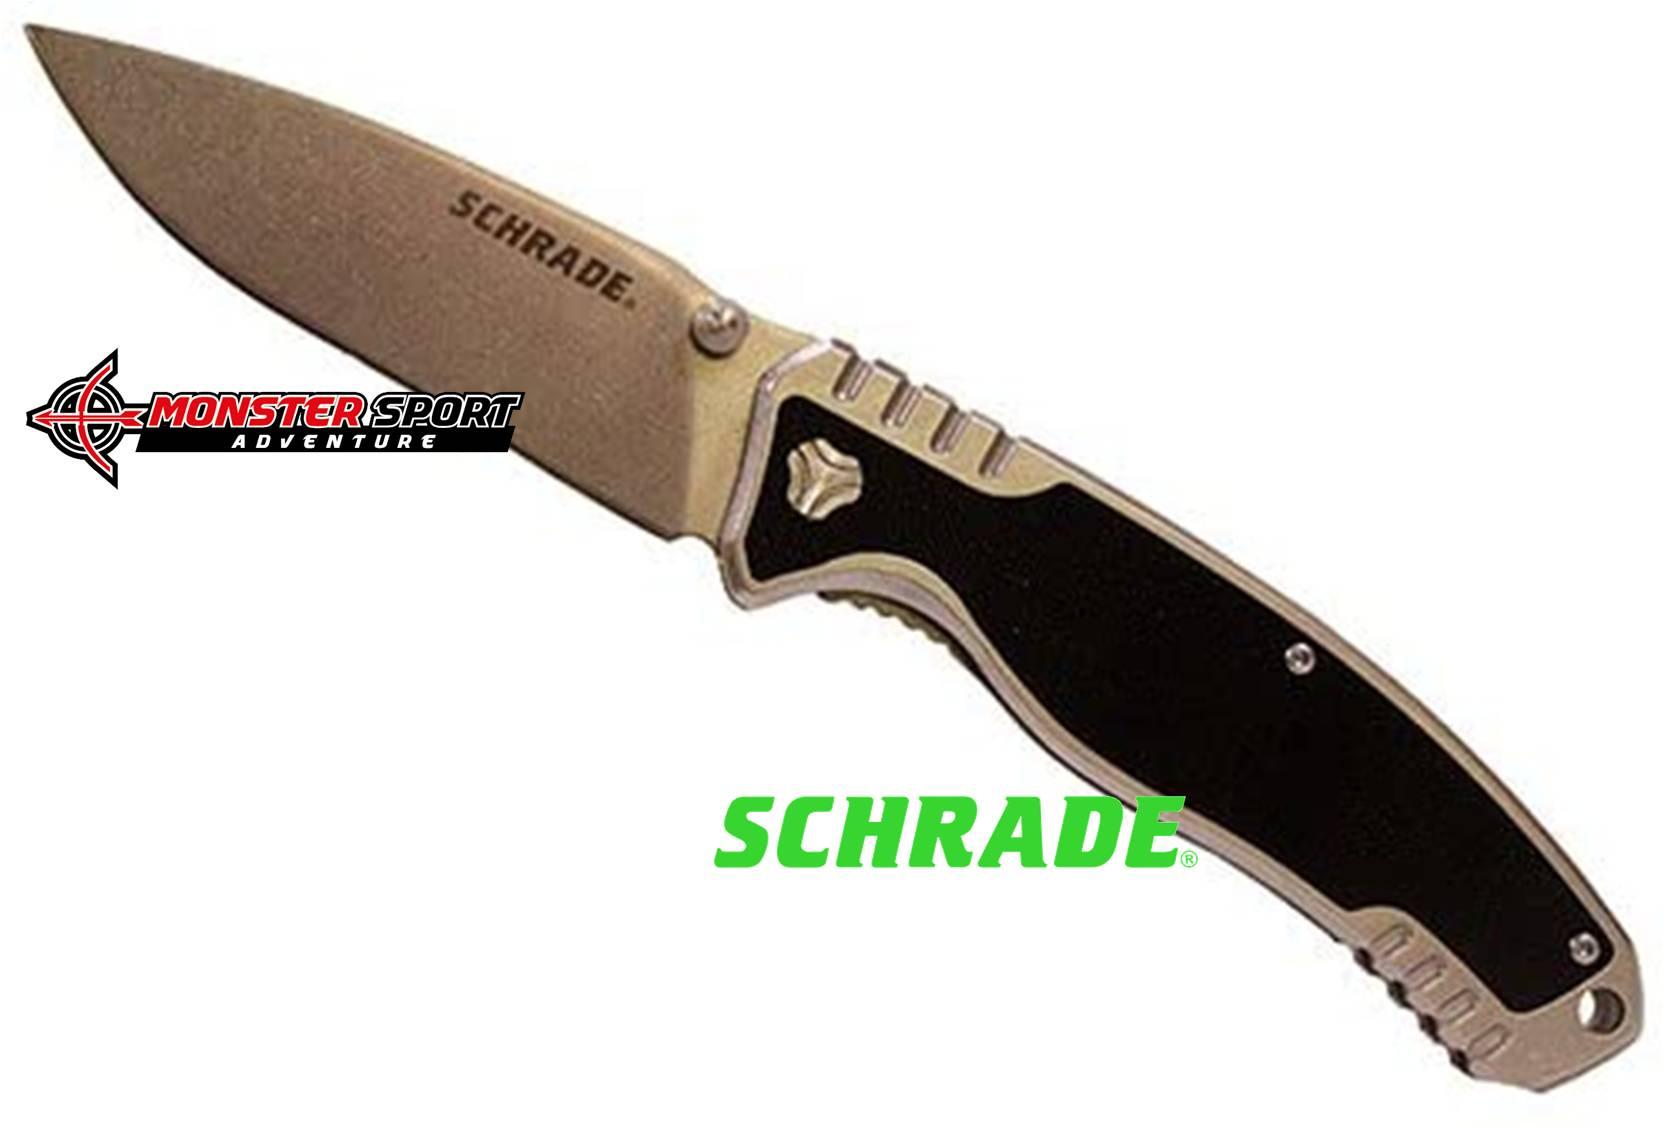 Schrade Ultra Glide Linerlock Folding Blade Drop Point SCH305